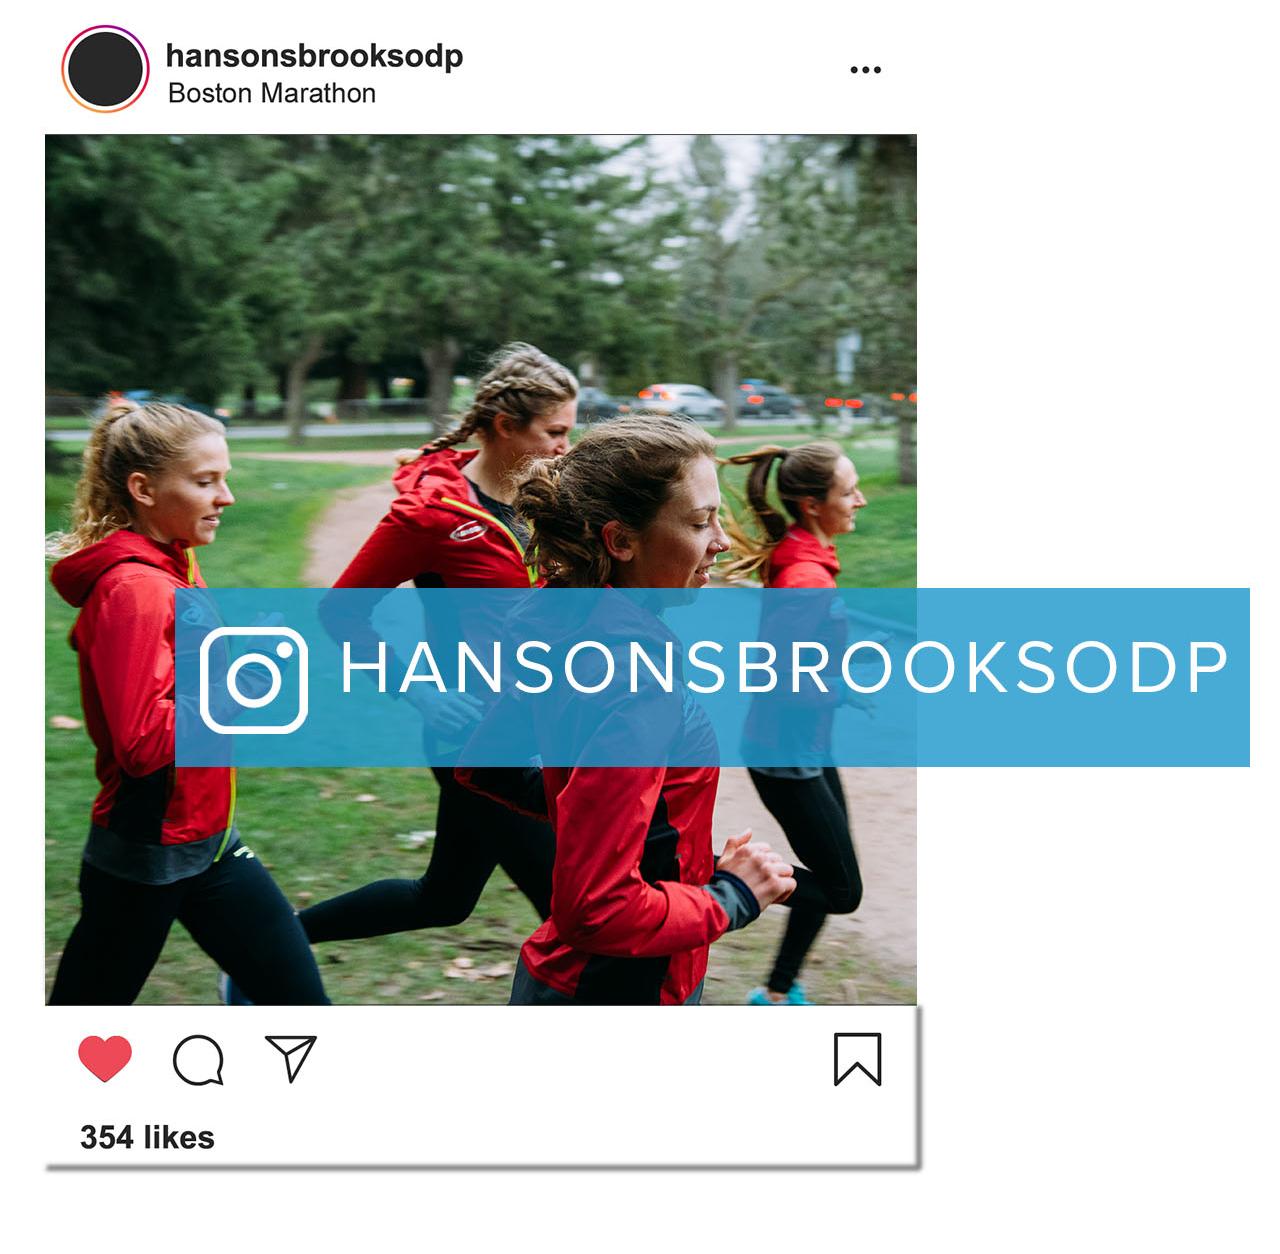 @HansonsBrooksODP